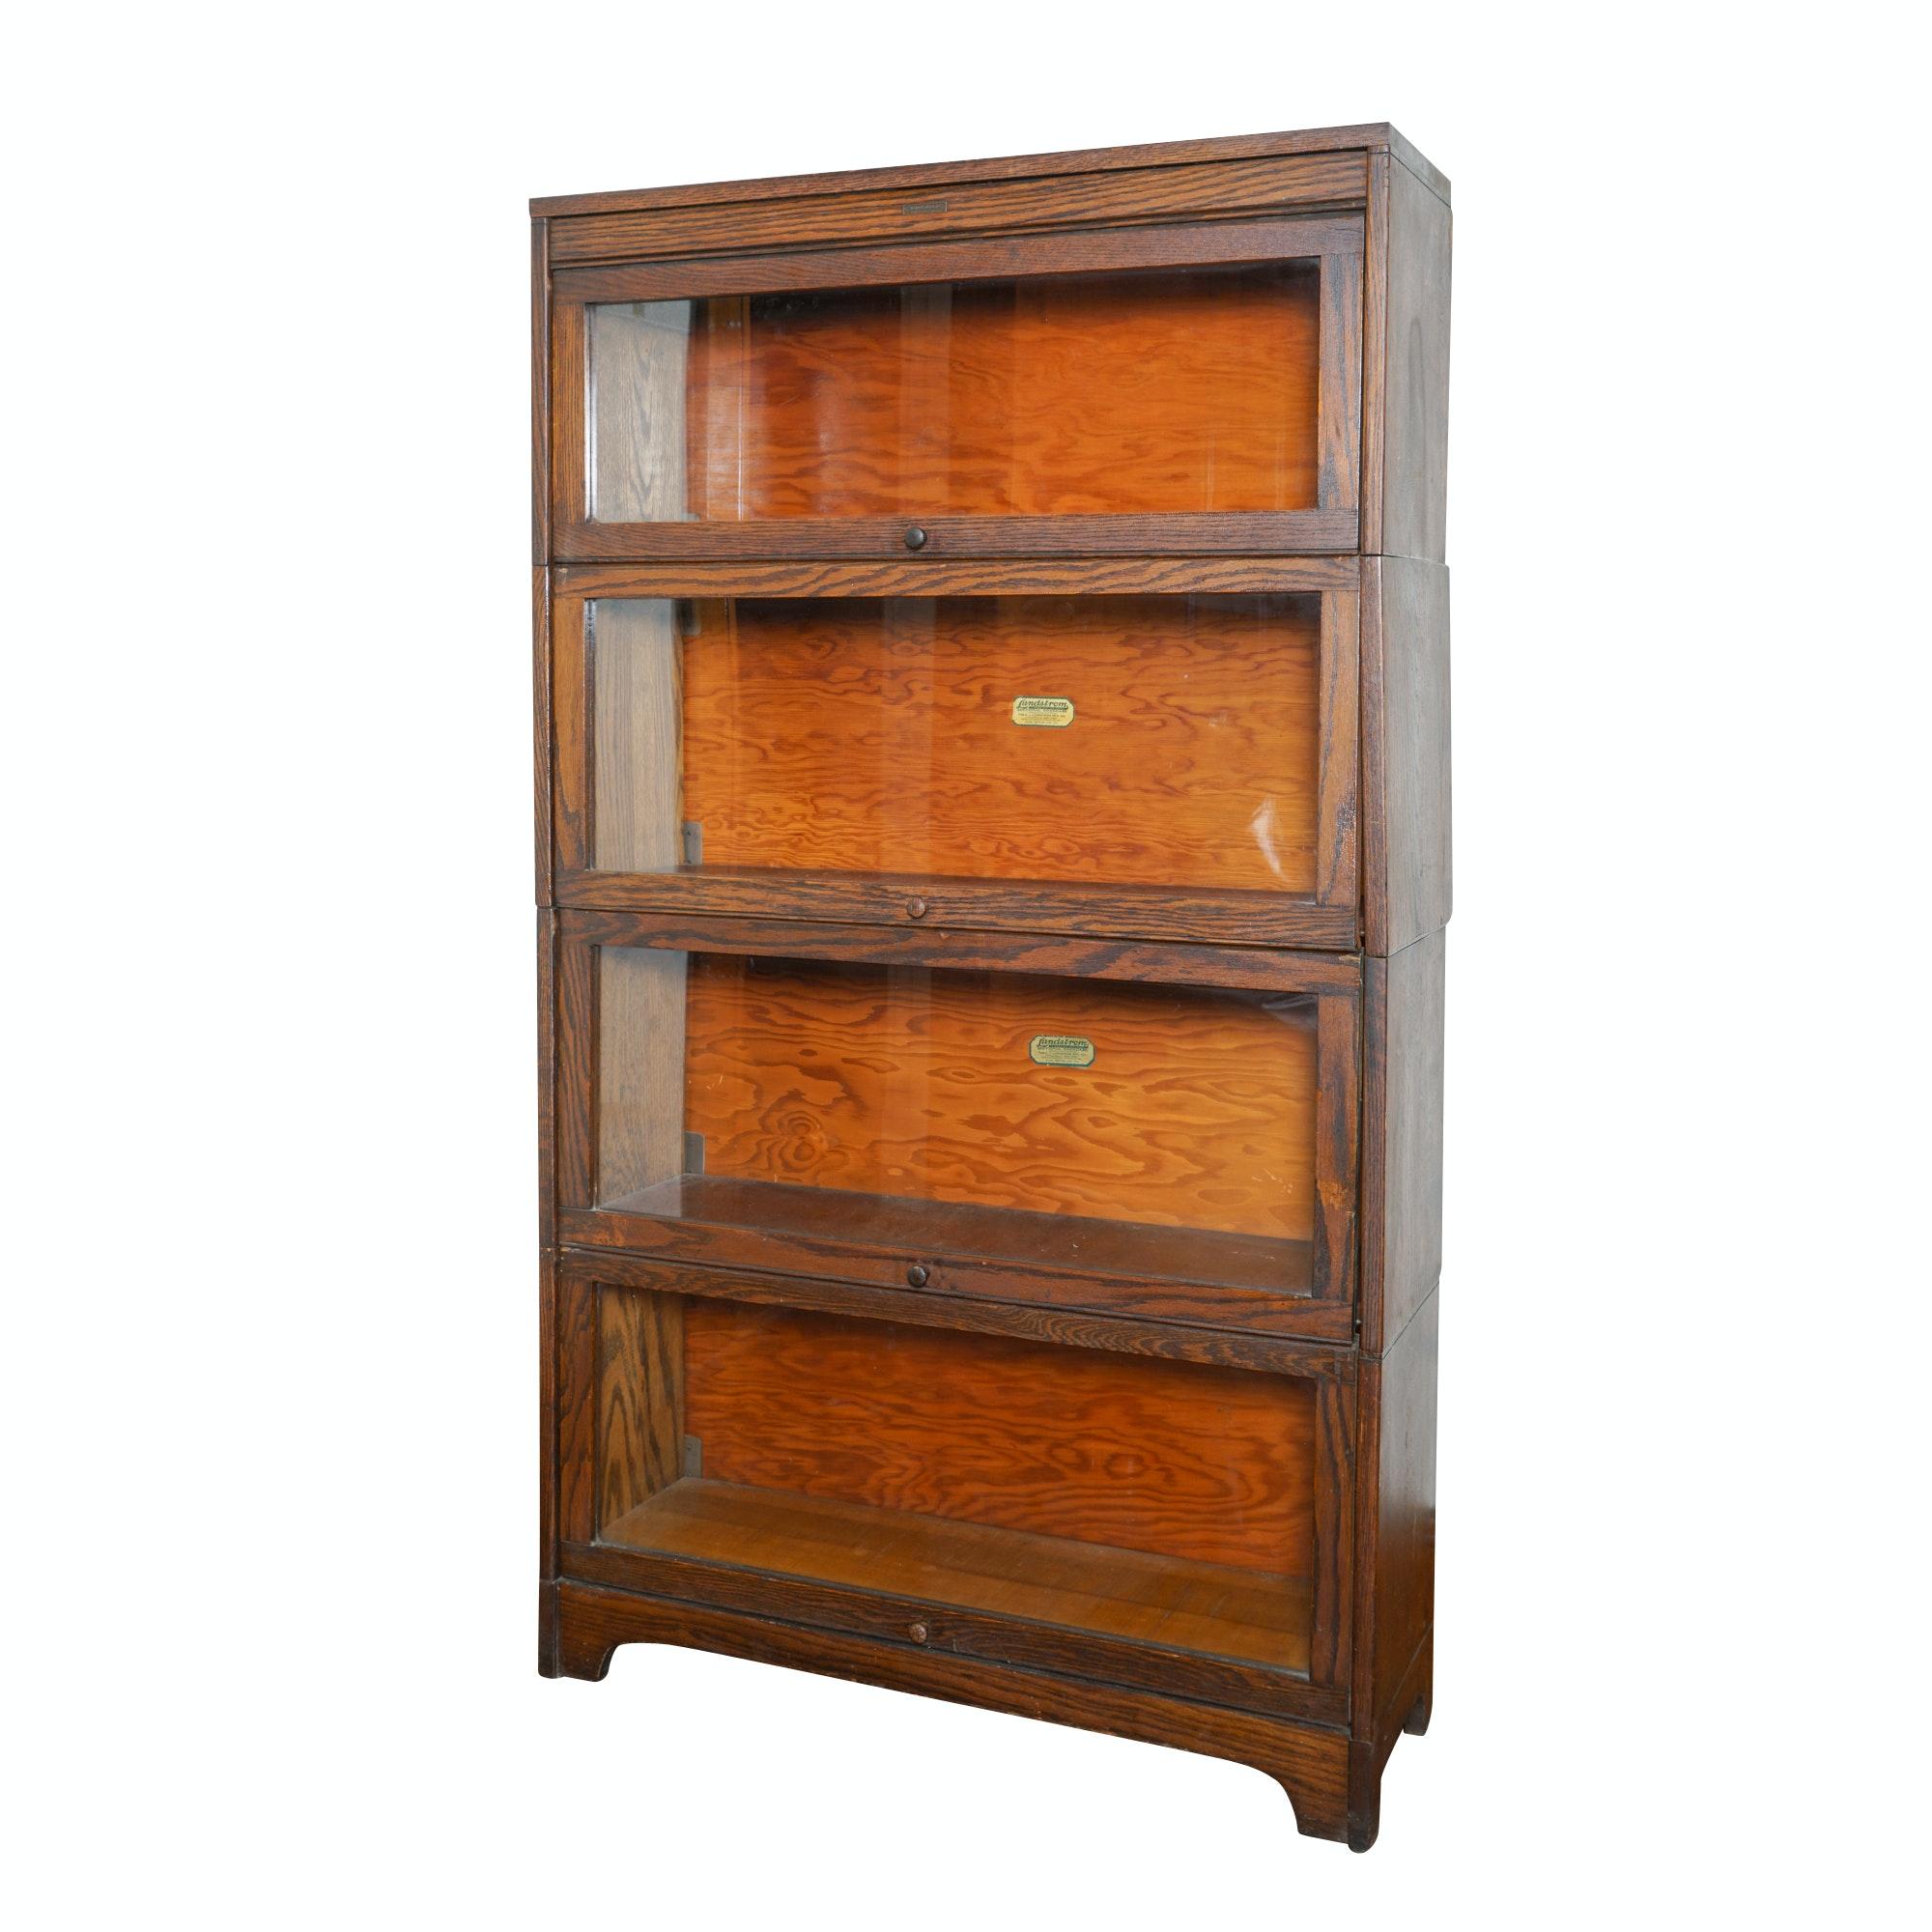 Vintage Oak Barrister Bookcase by Lundstrom